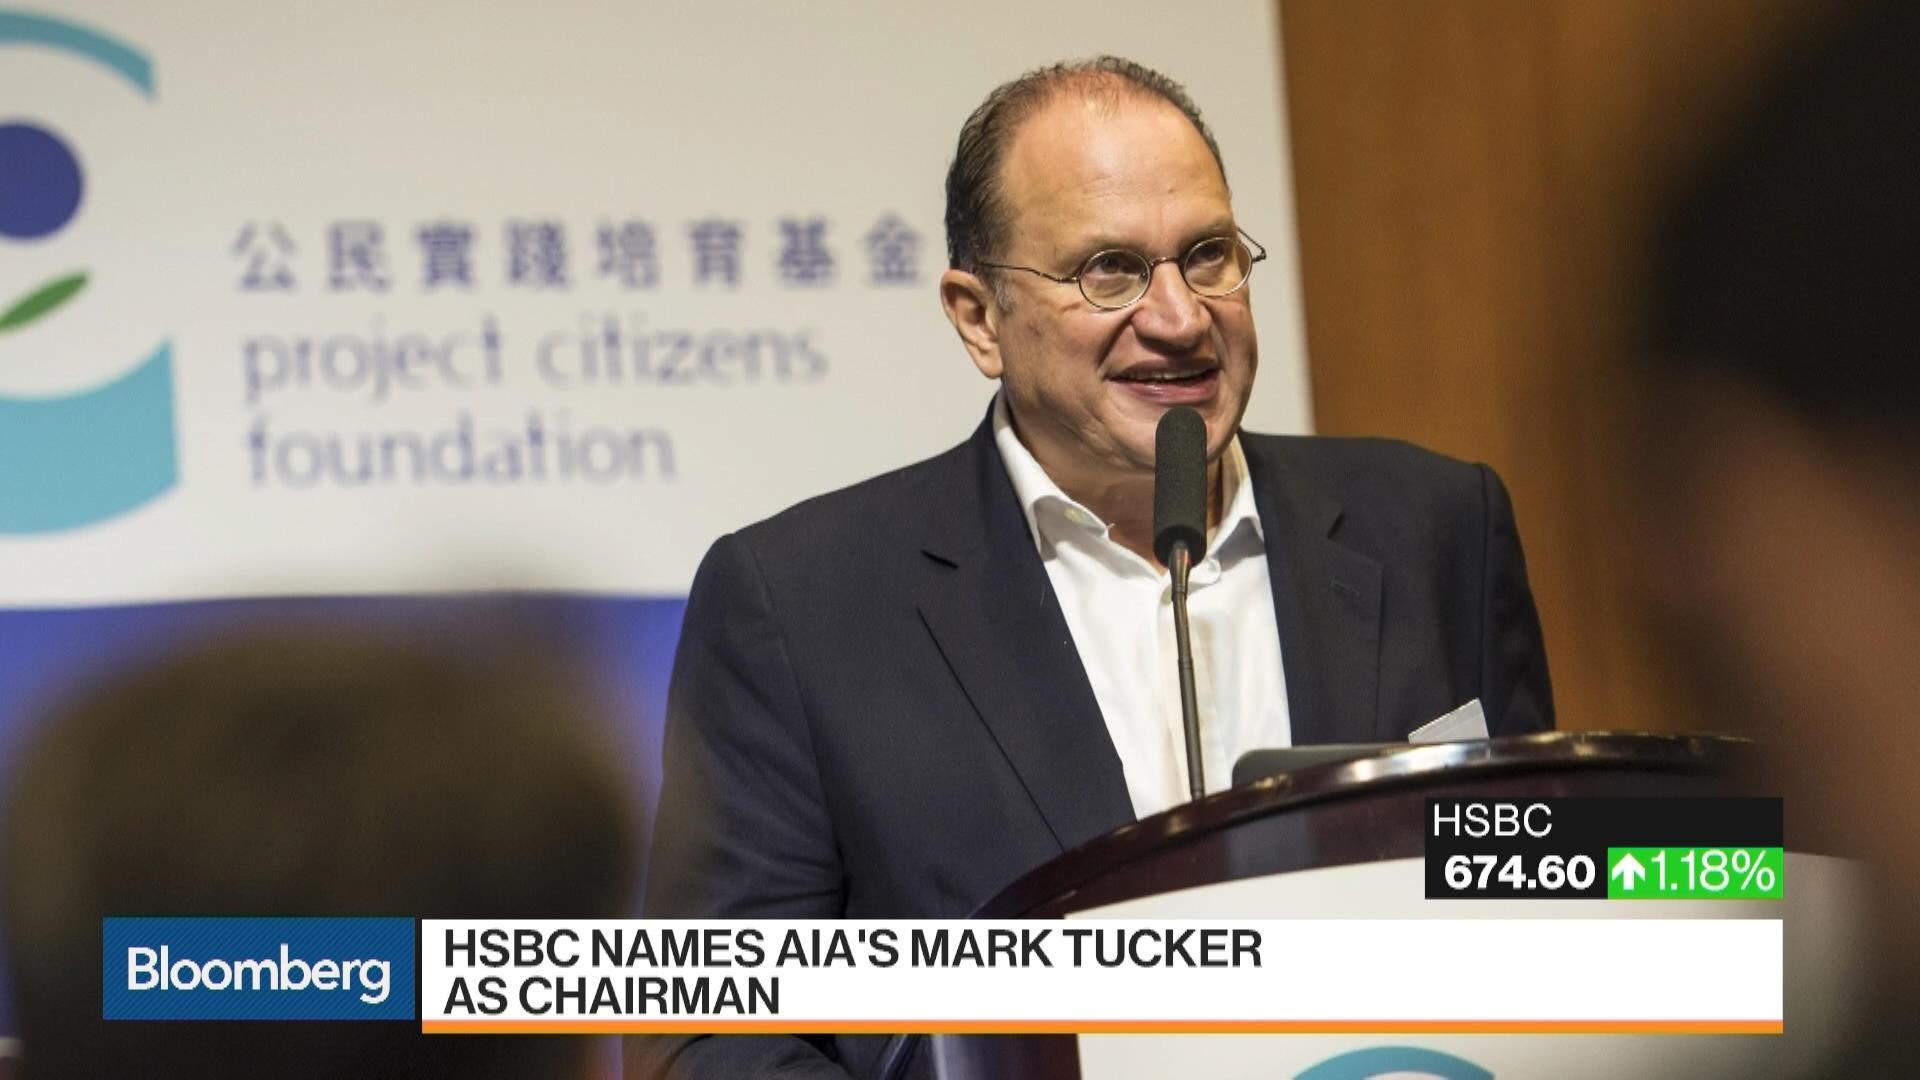 HSBC Said Close to Naming AIA's Mark Tucker as Chairman